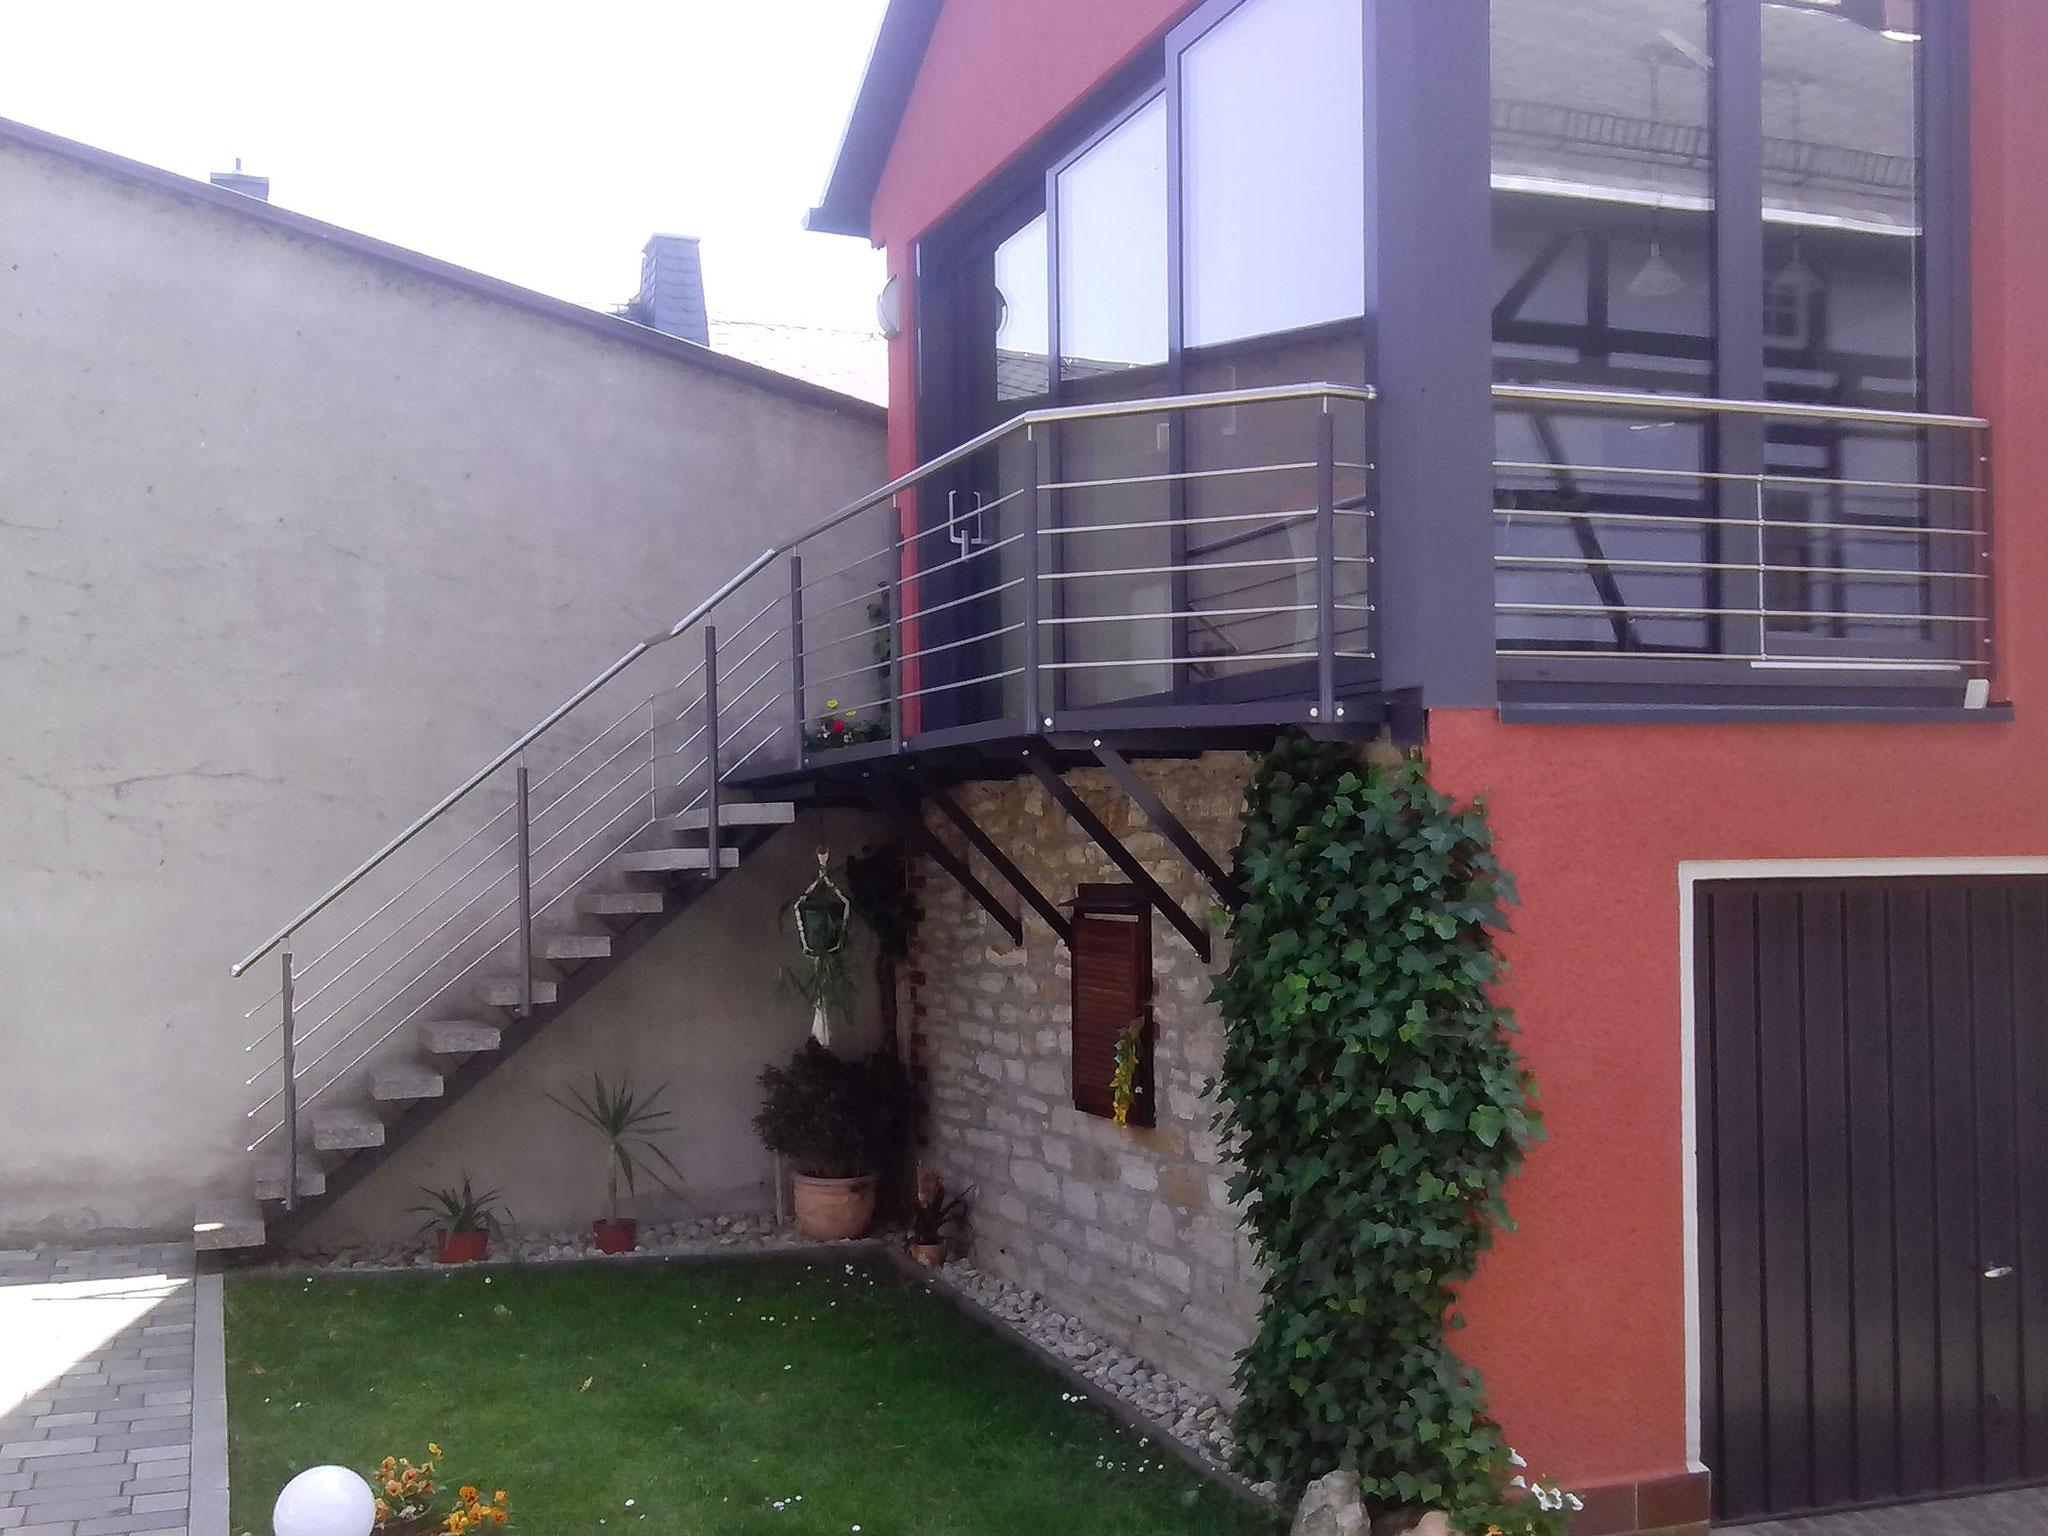 Metall-Treppengeländer